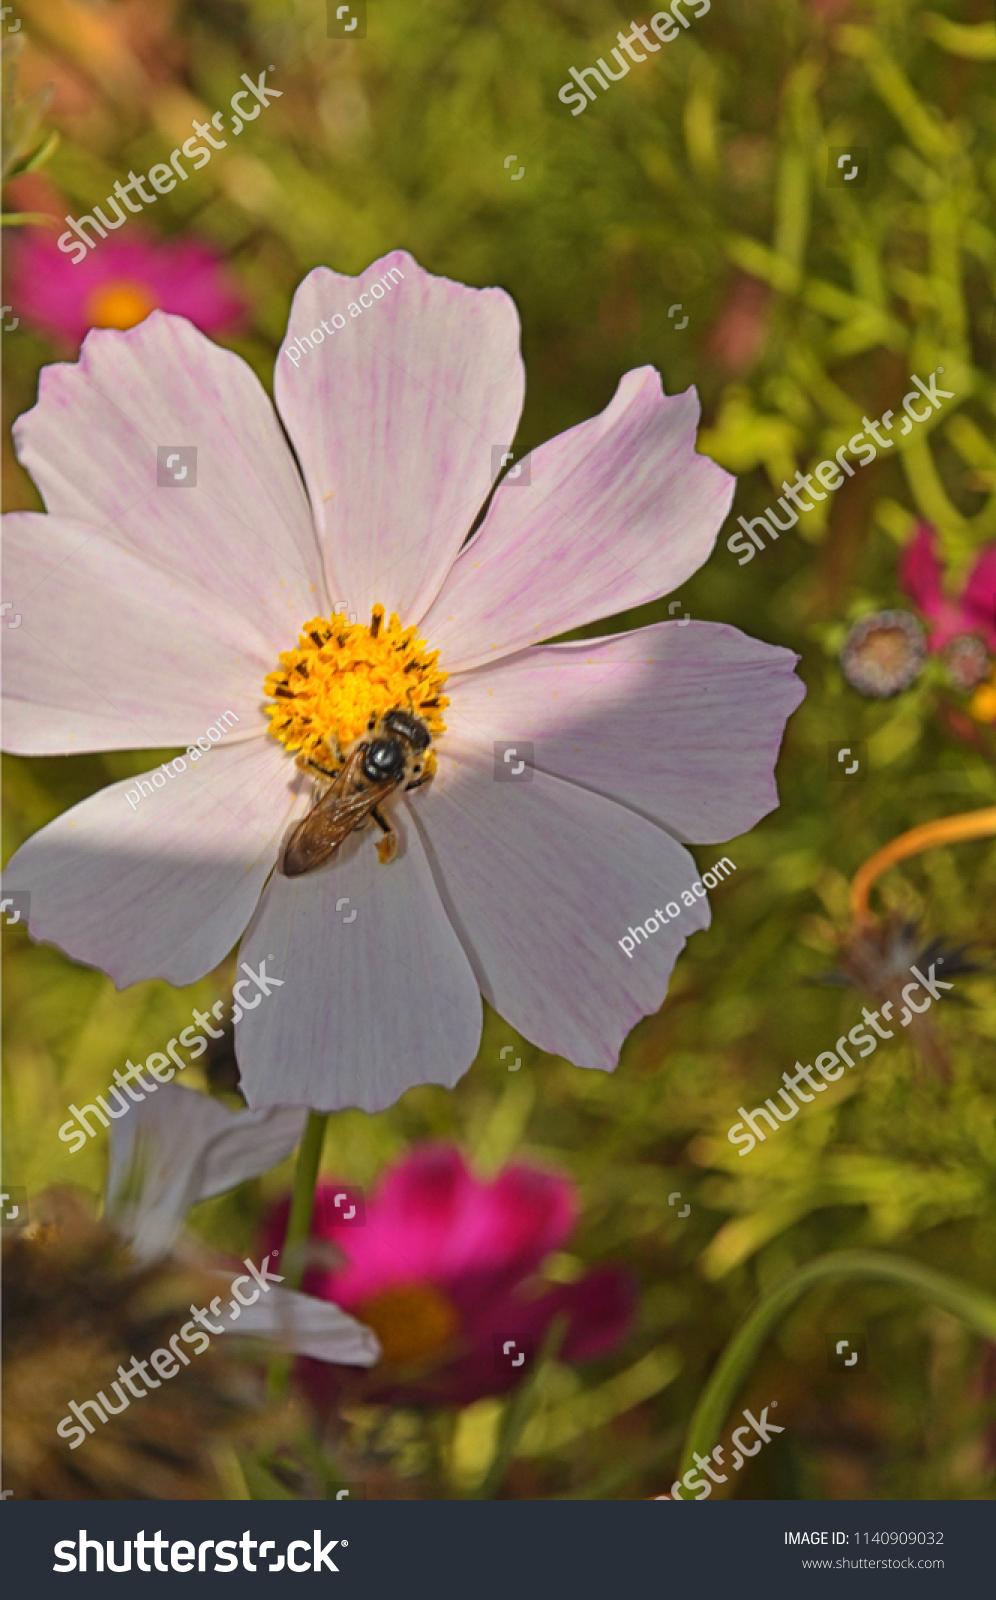 Bee on daisy flower stock photo royalty free 1140909032 shutterstock bee on the daisy flower izmirmasajfo